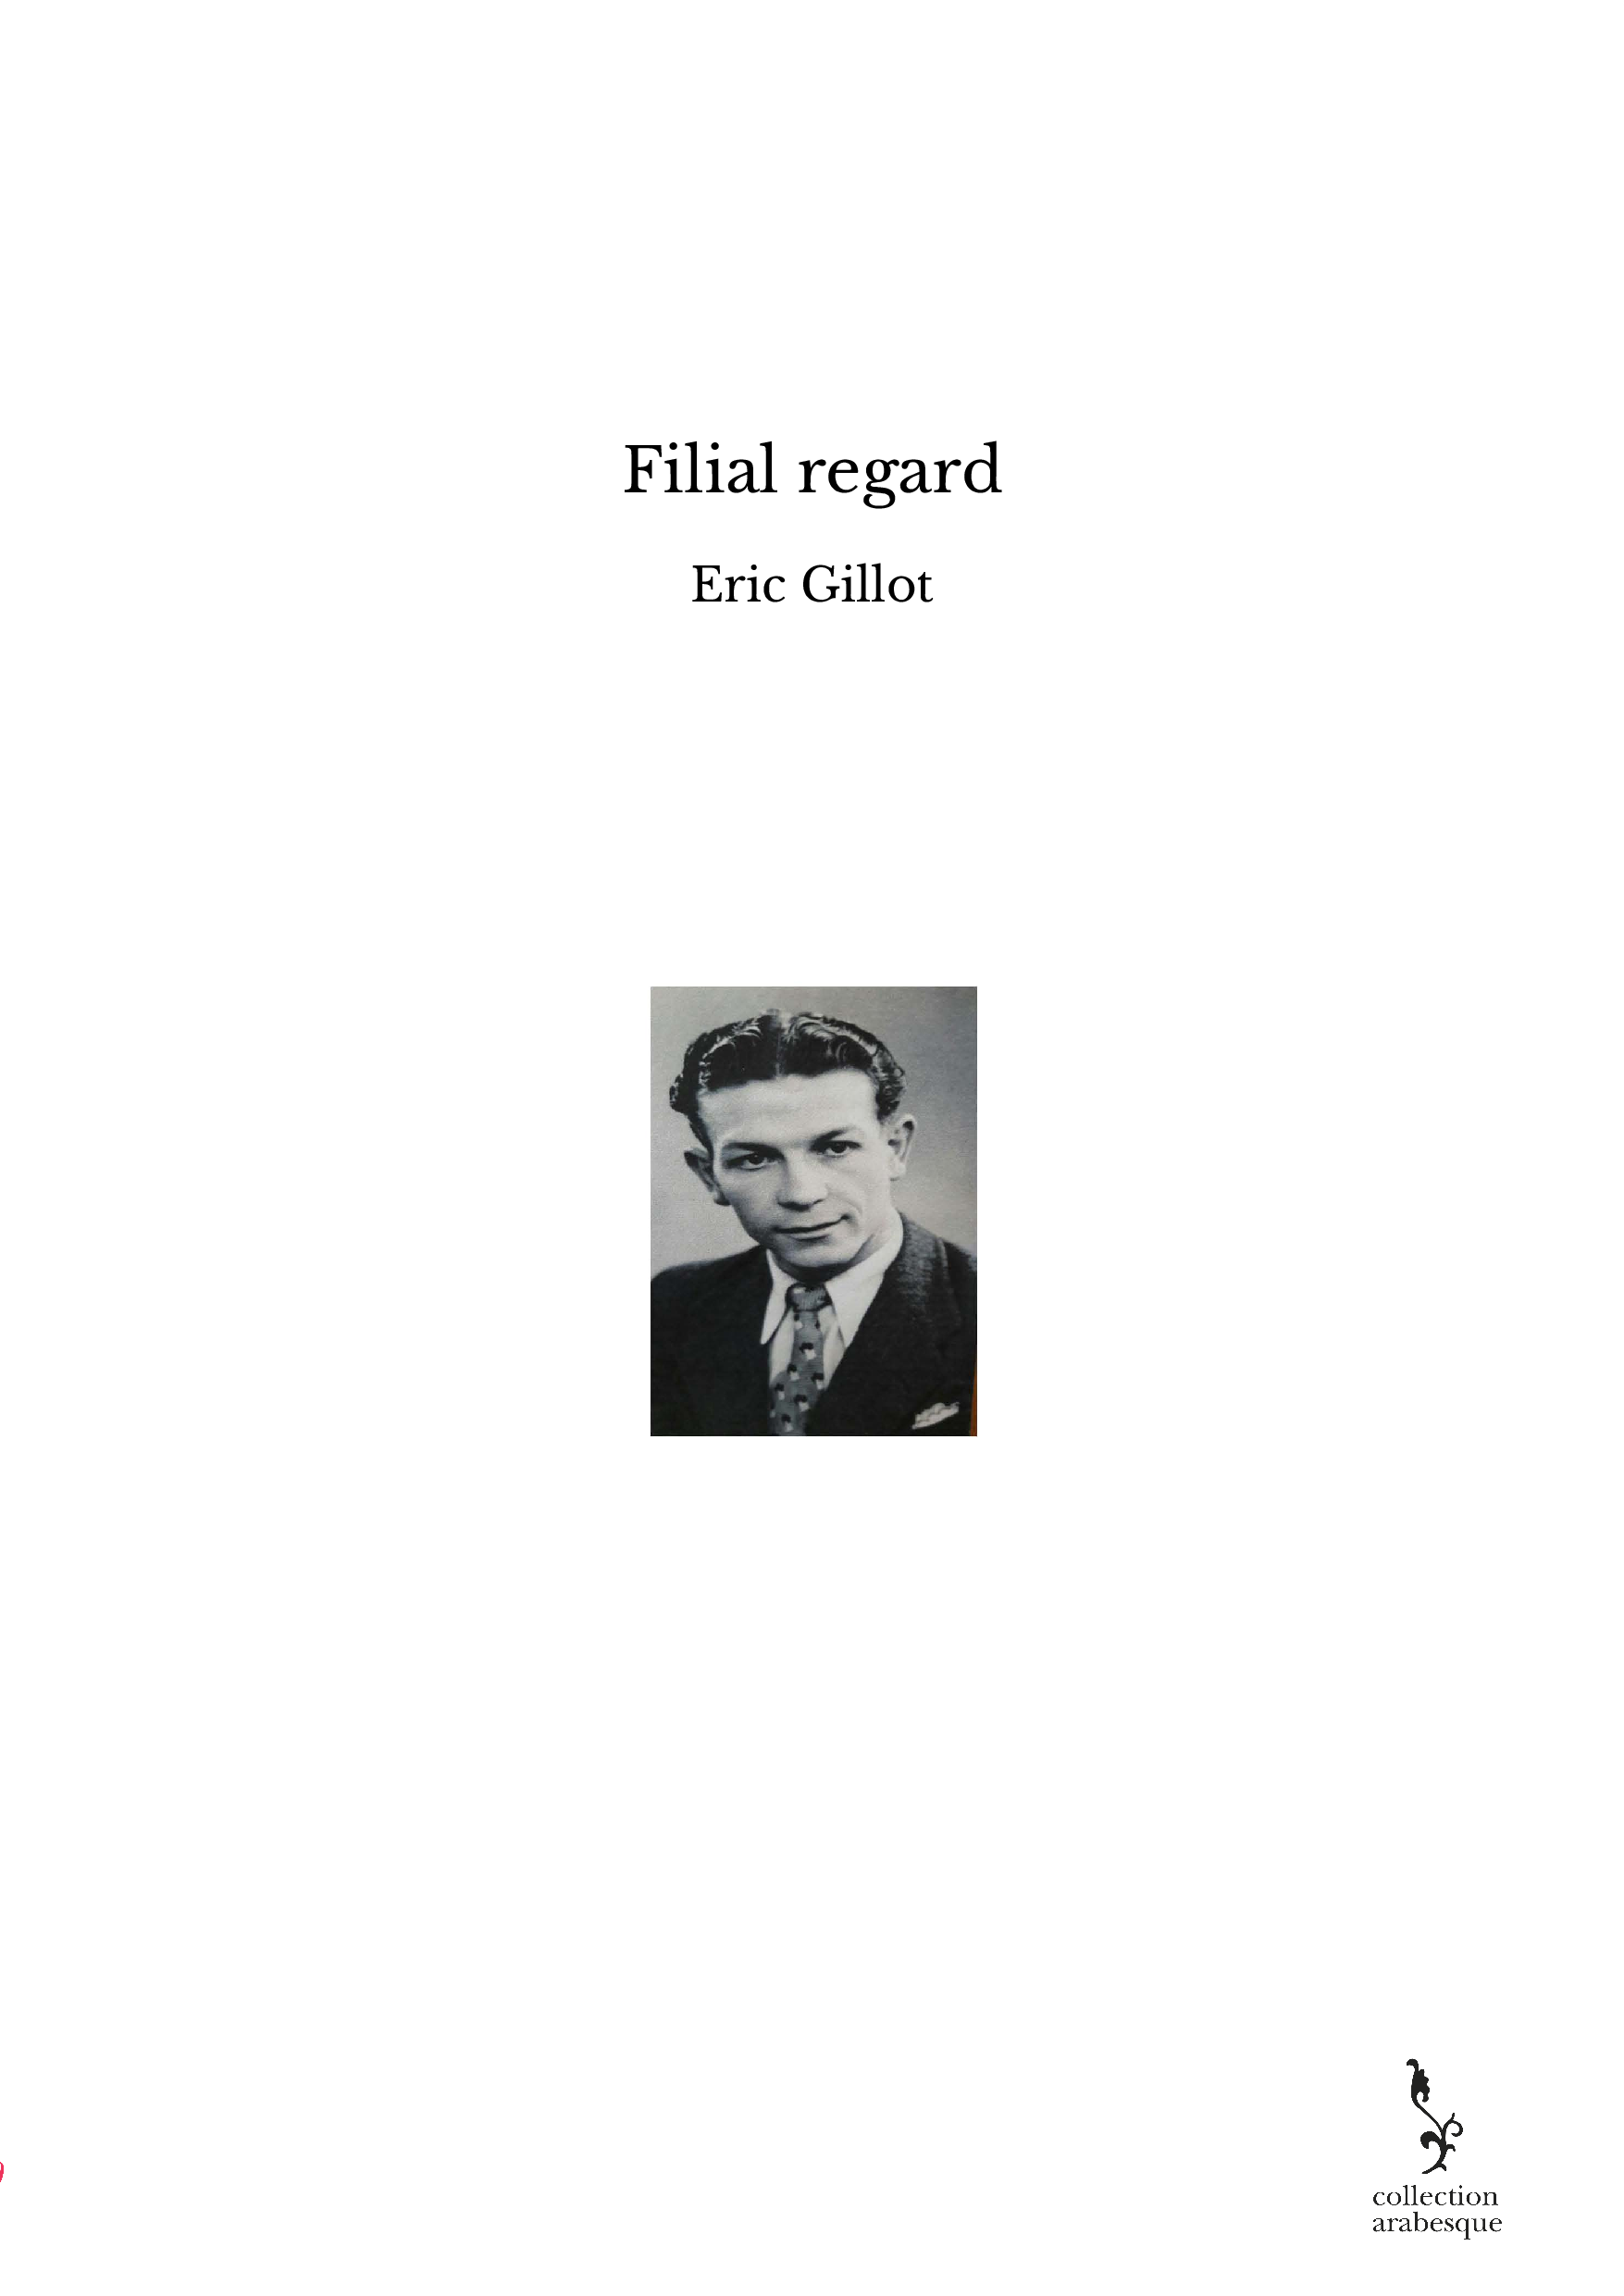 Filial regard